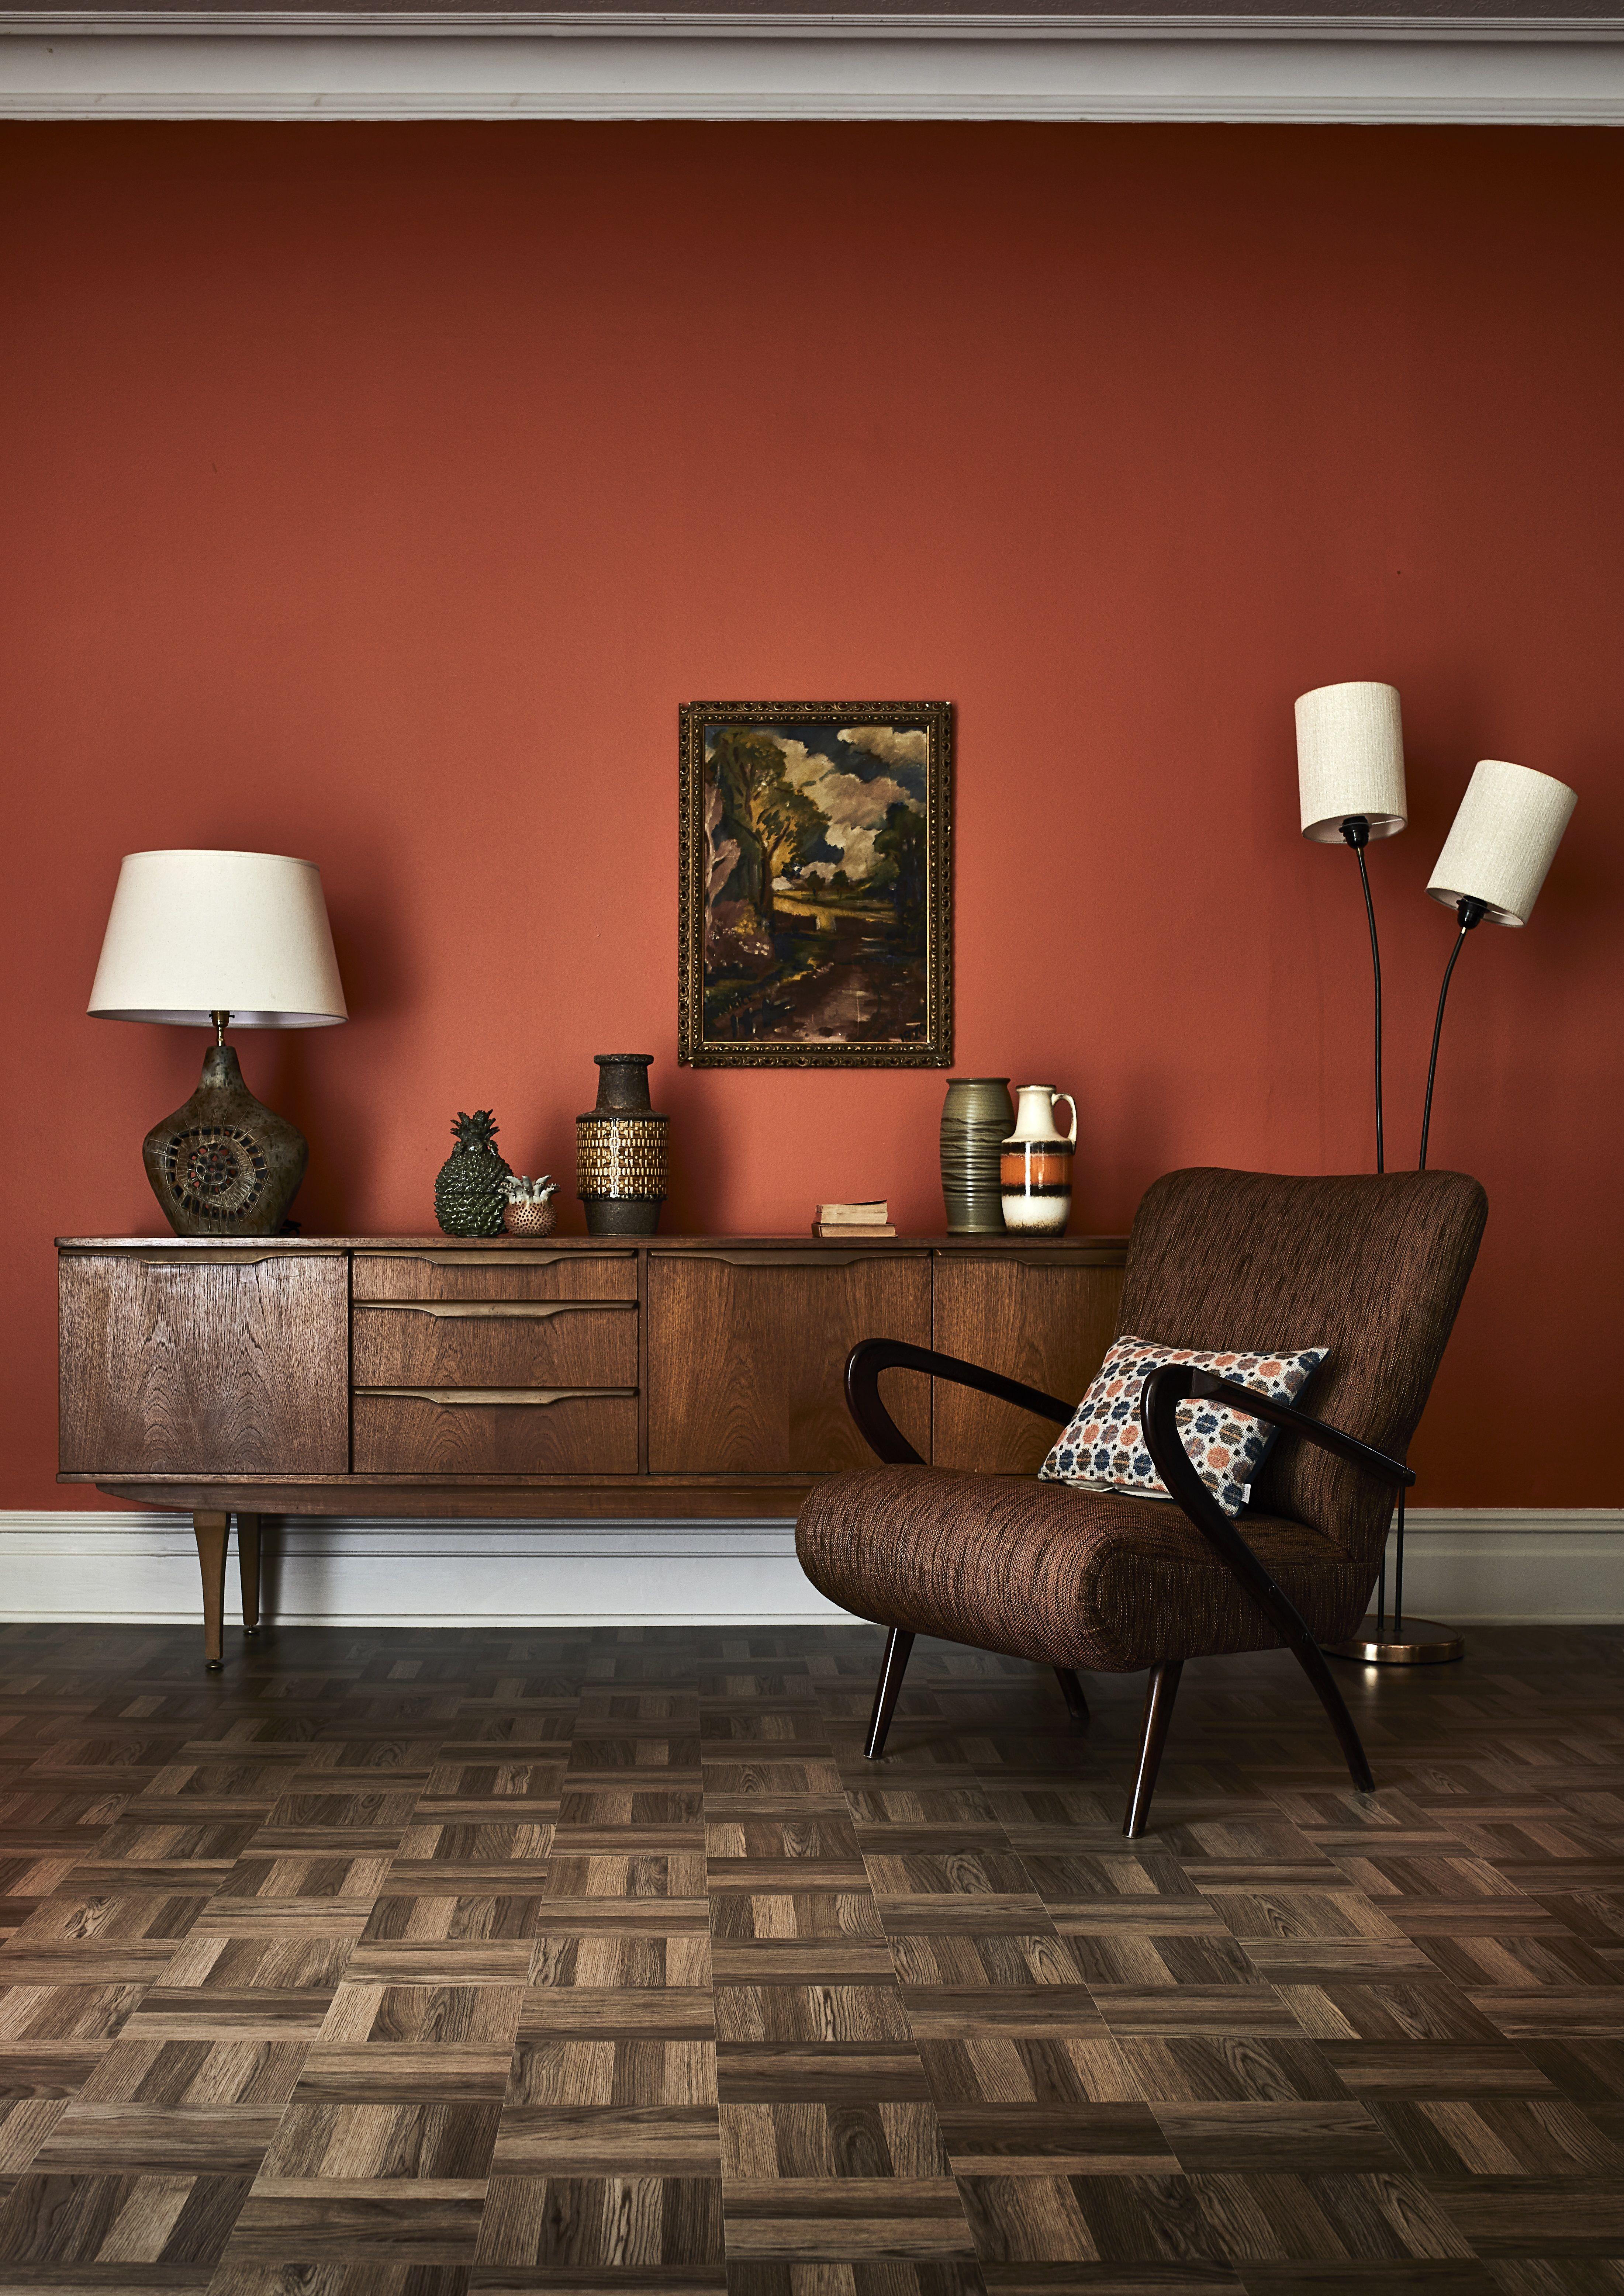 Xpressions Blocks Laminate Style tile, Home decor, Home